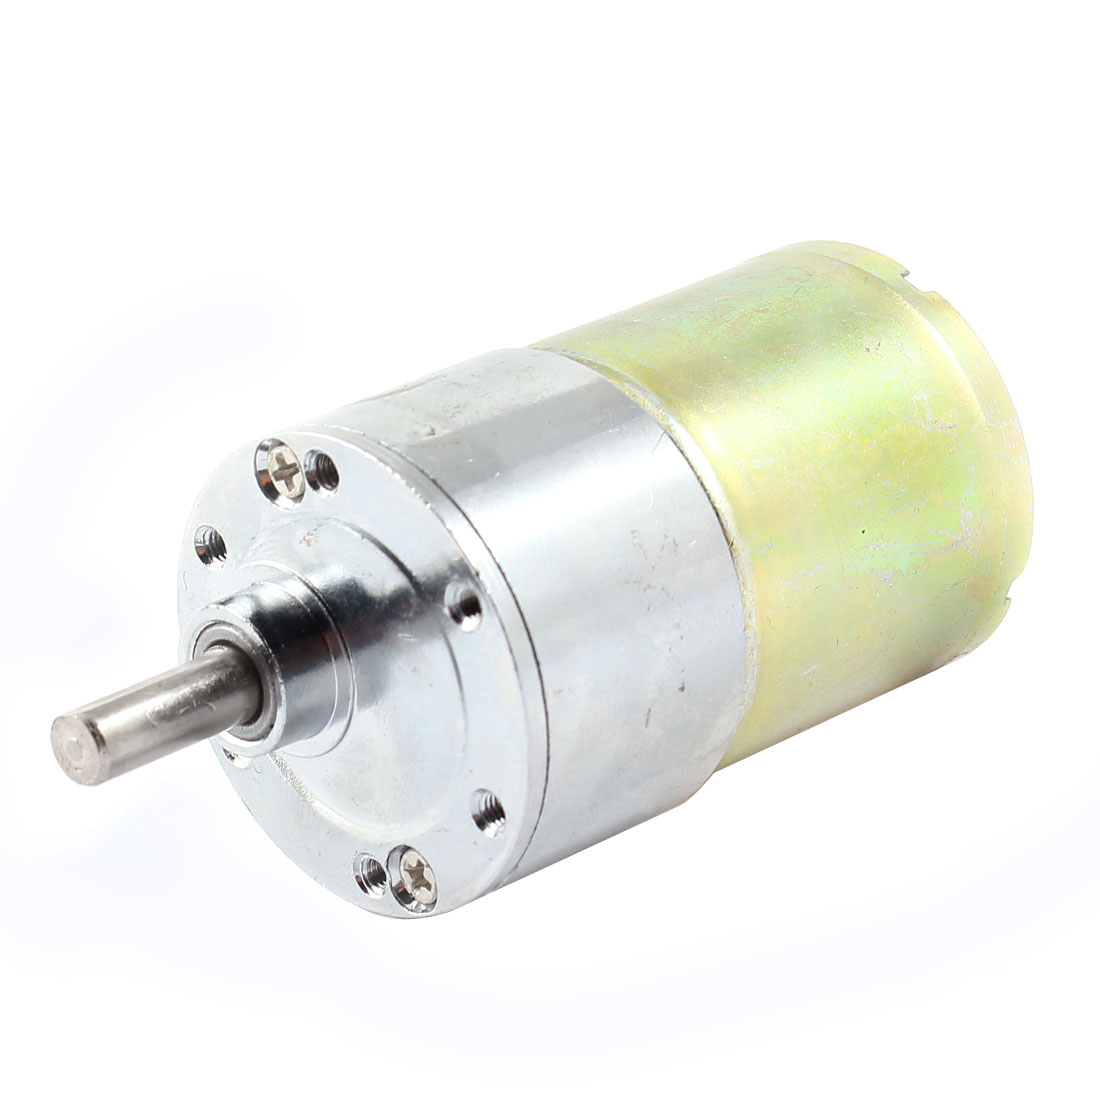 DC 24V 0.33A 8.6kg.cm Torque 37mm Dia Magnetic DC Gear Box Motor 200 RPM